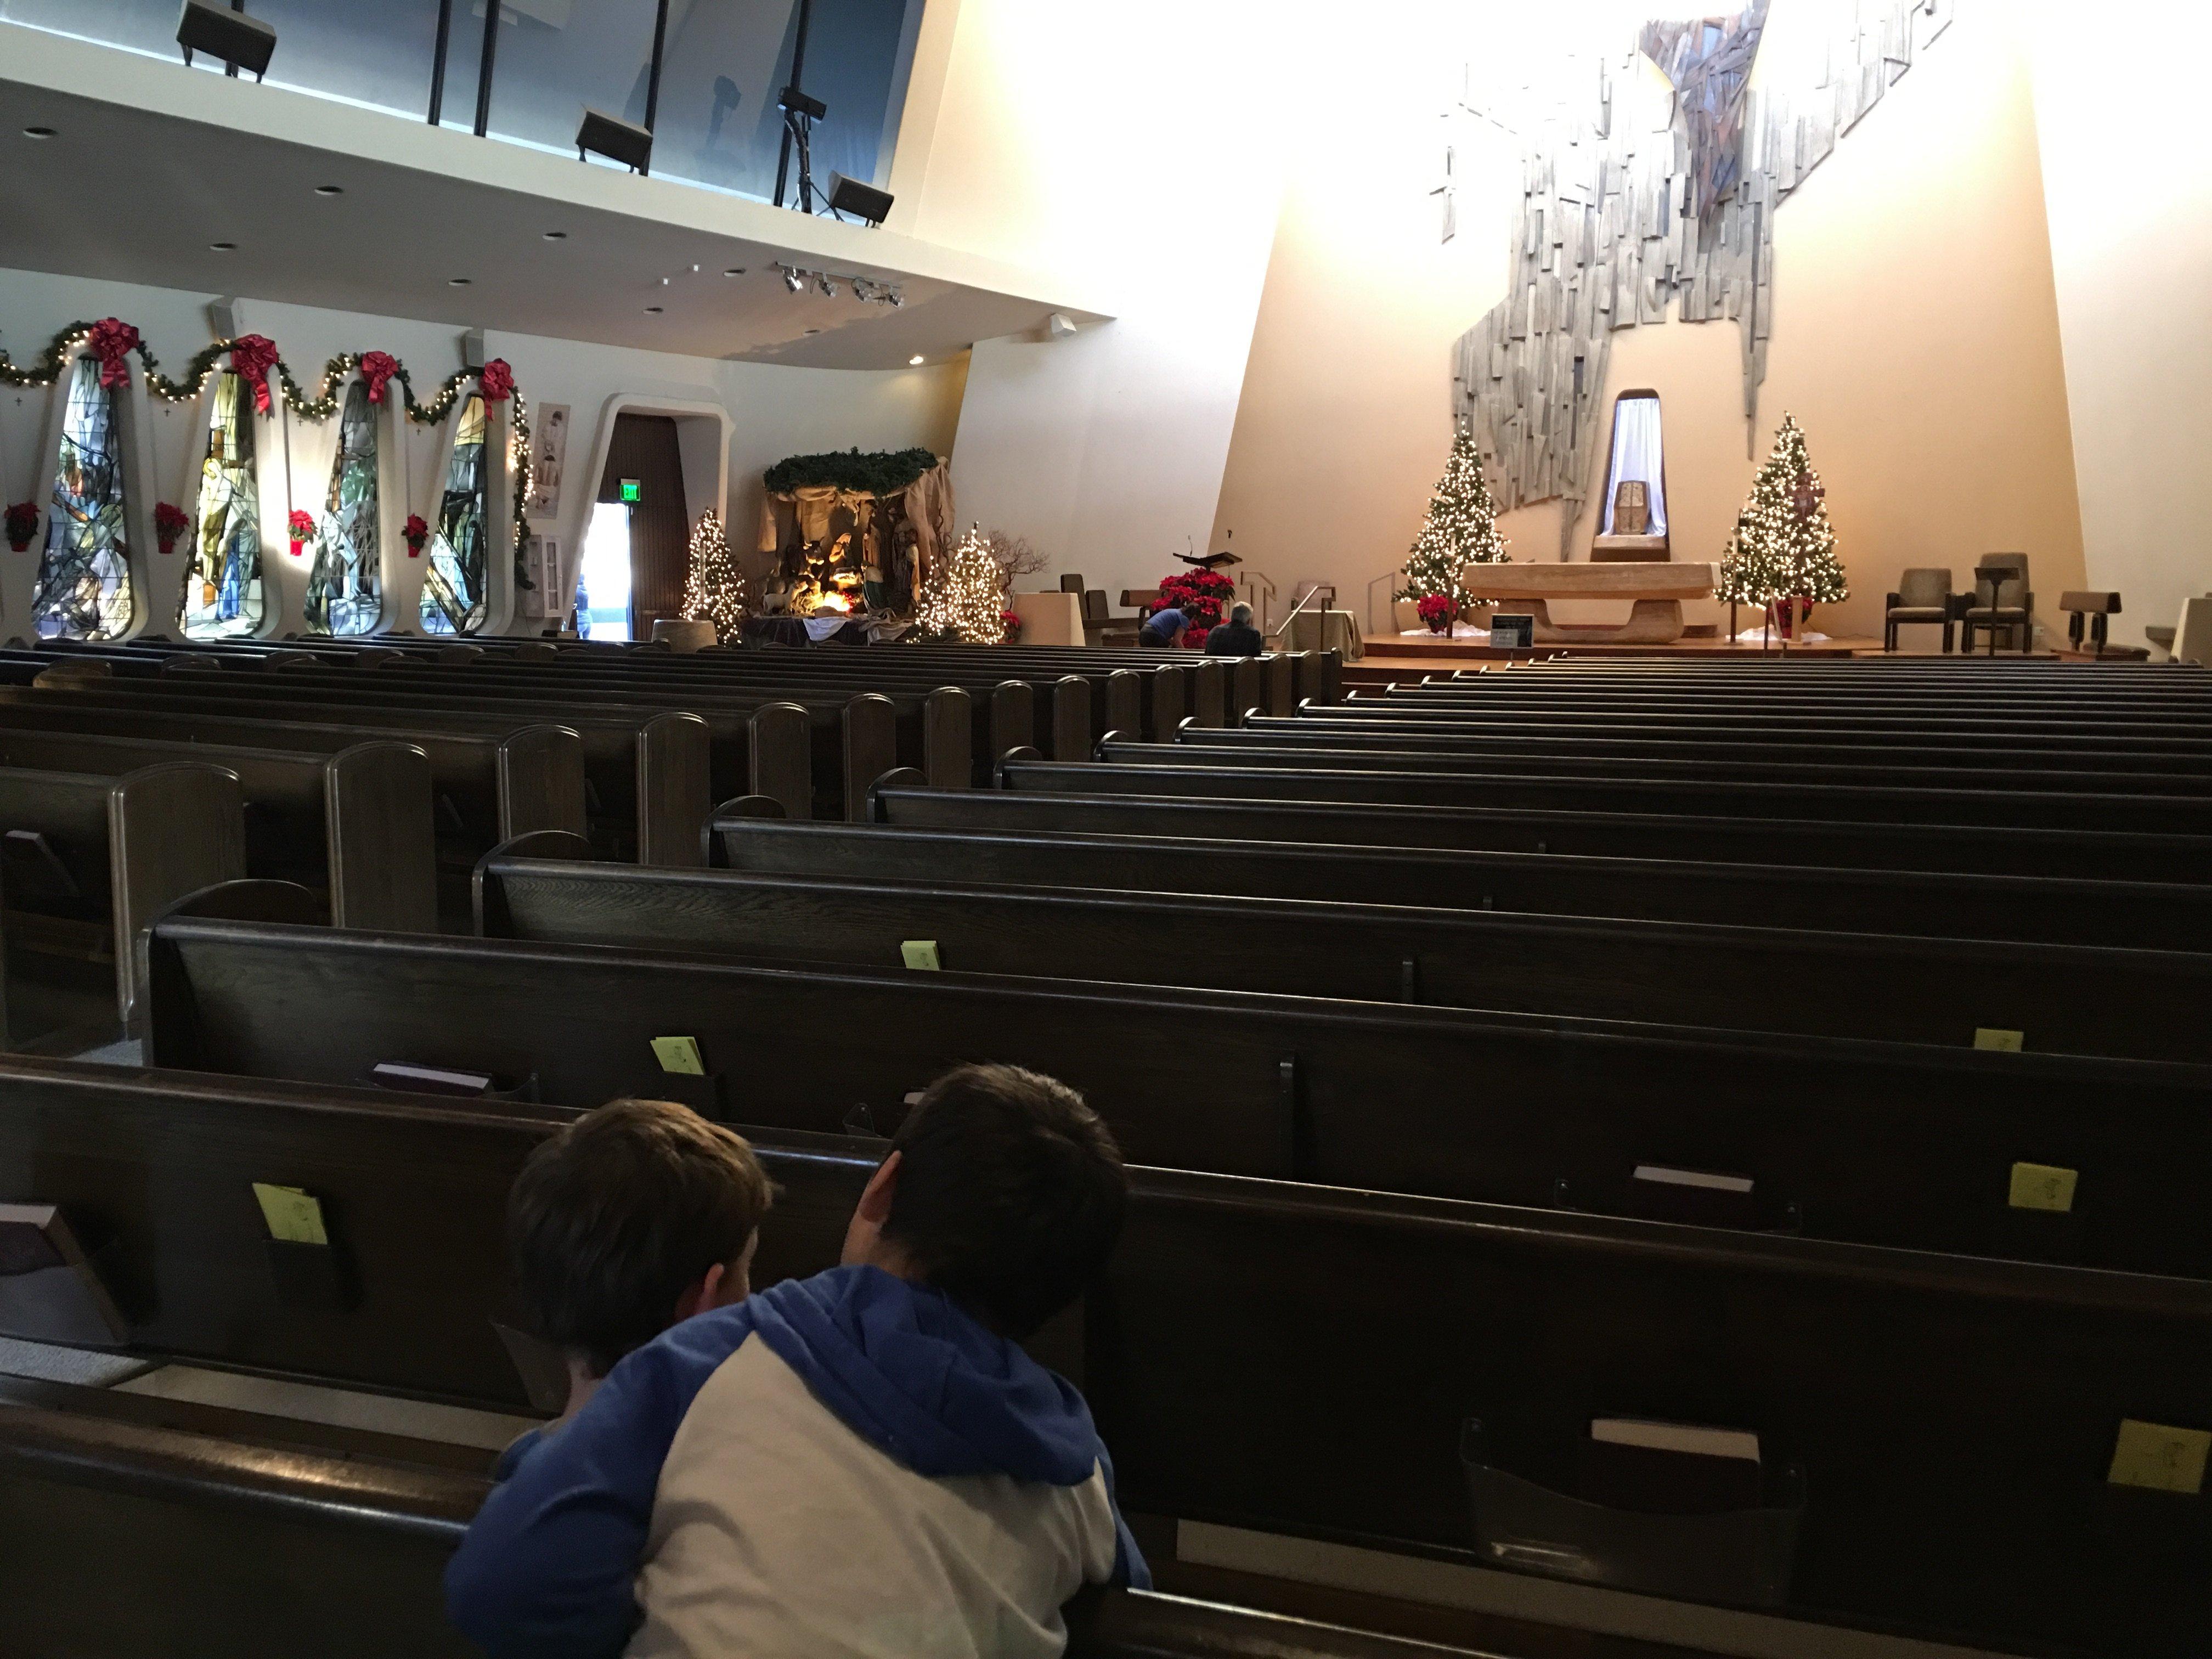 20210118 MHayes 2 My Children at St. Rita Parish Sierra Madre